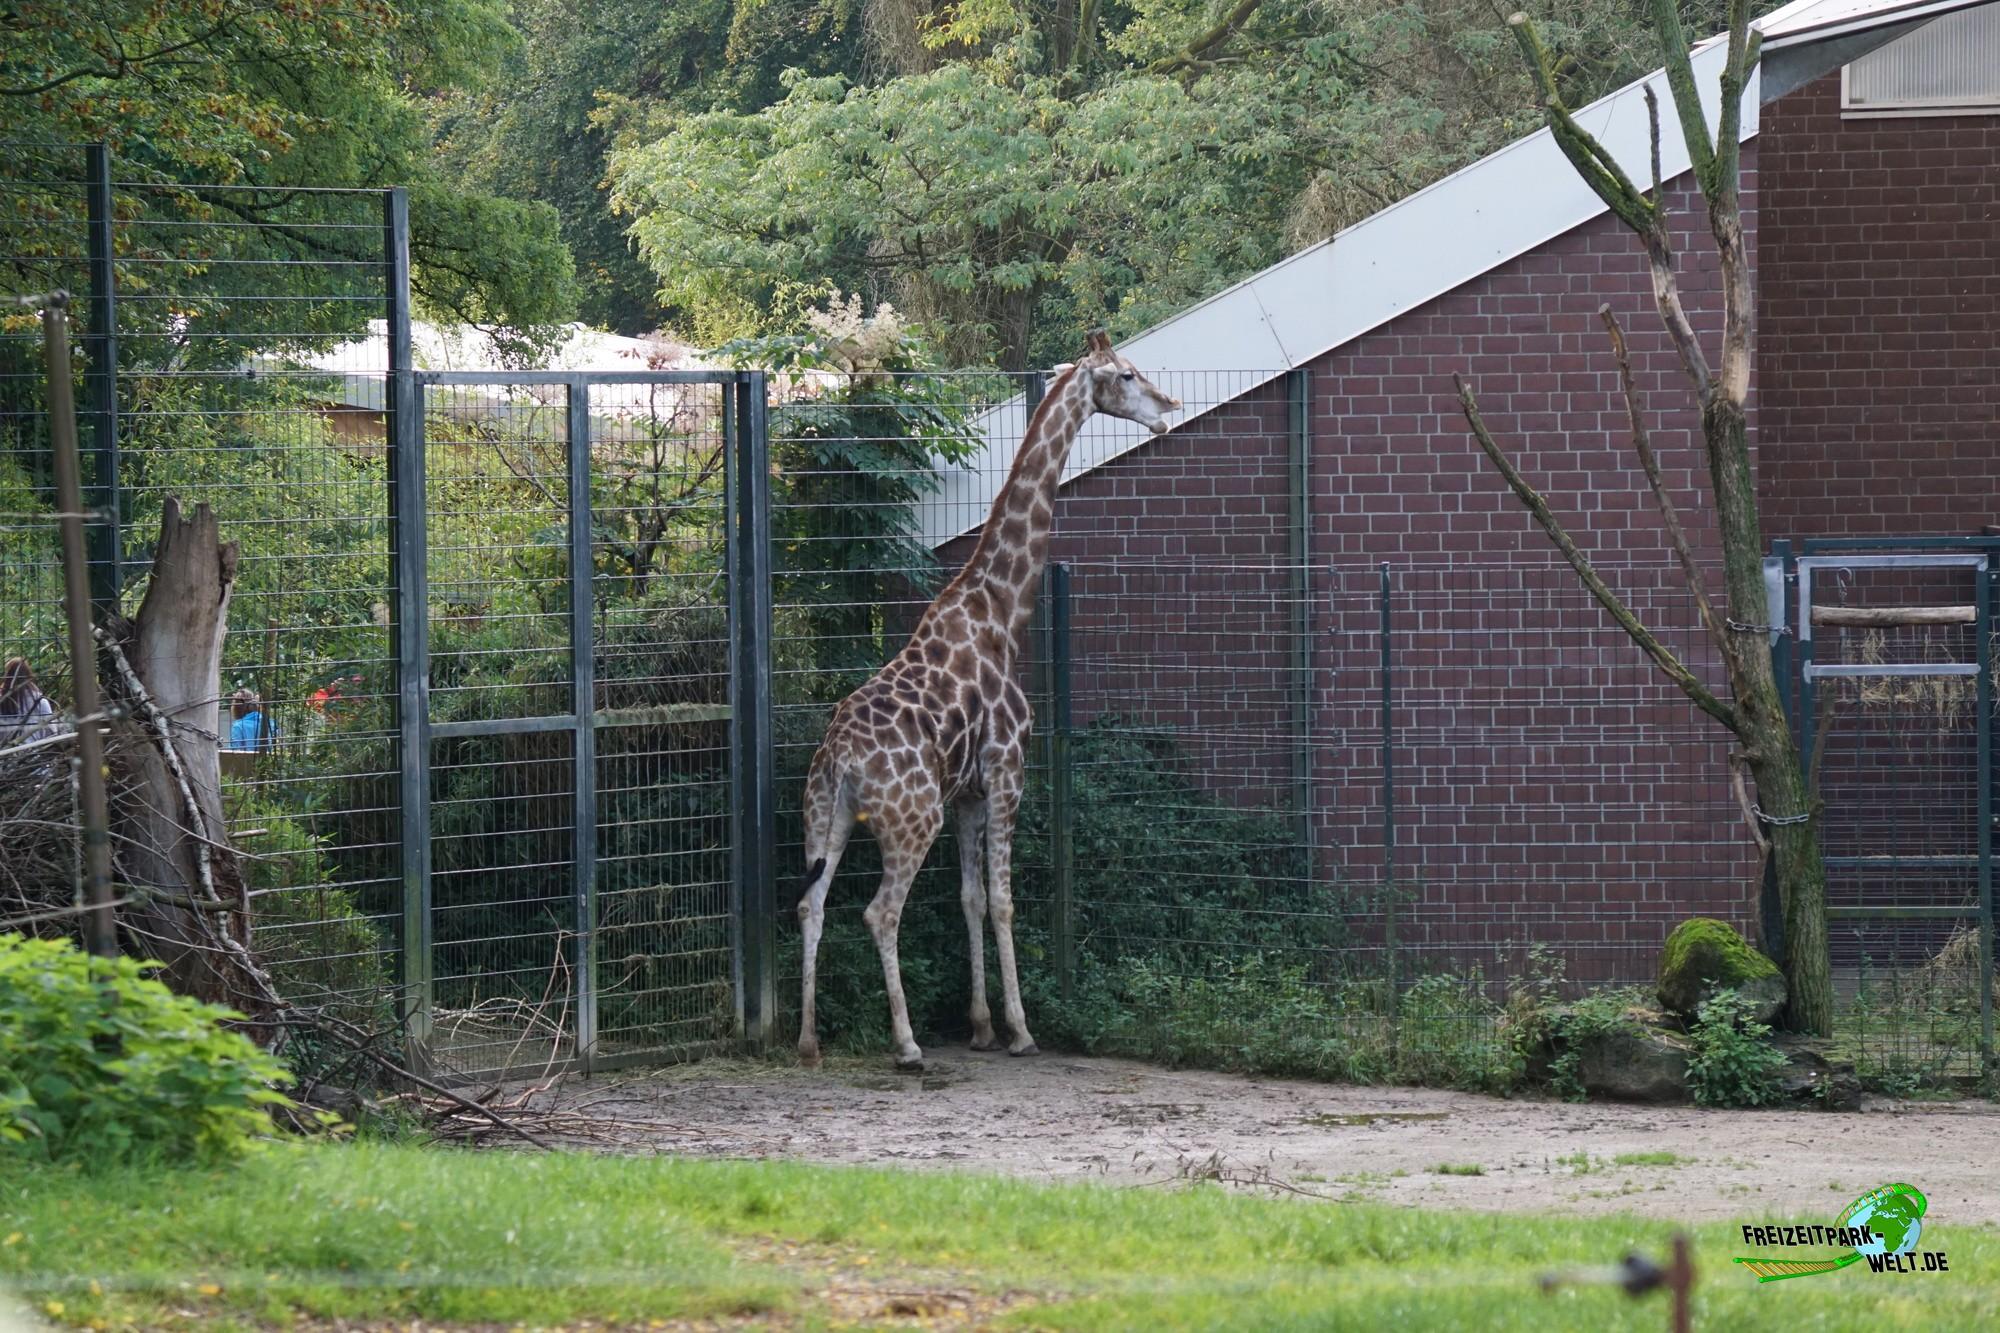 giraffe zoo dortmund freizeitpark. Black Bedroom Furniture Sets. Home Design Ideas